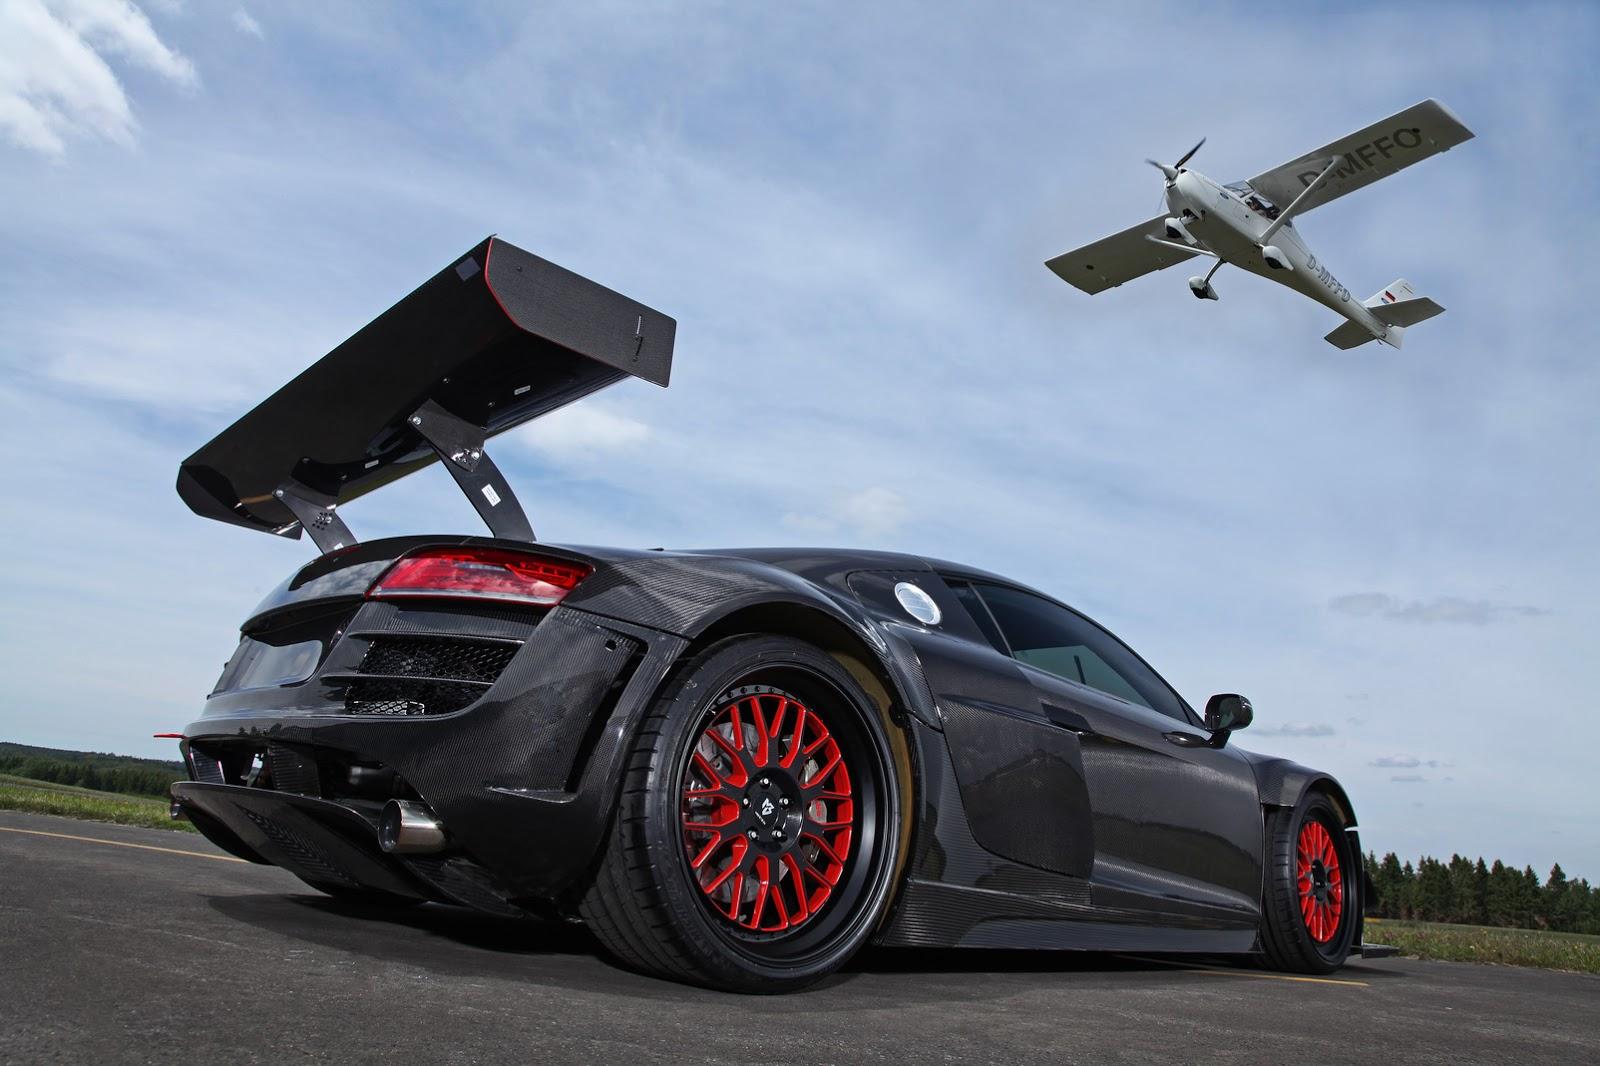 Audi-R8-Recon-MR8-7.jpg